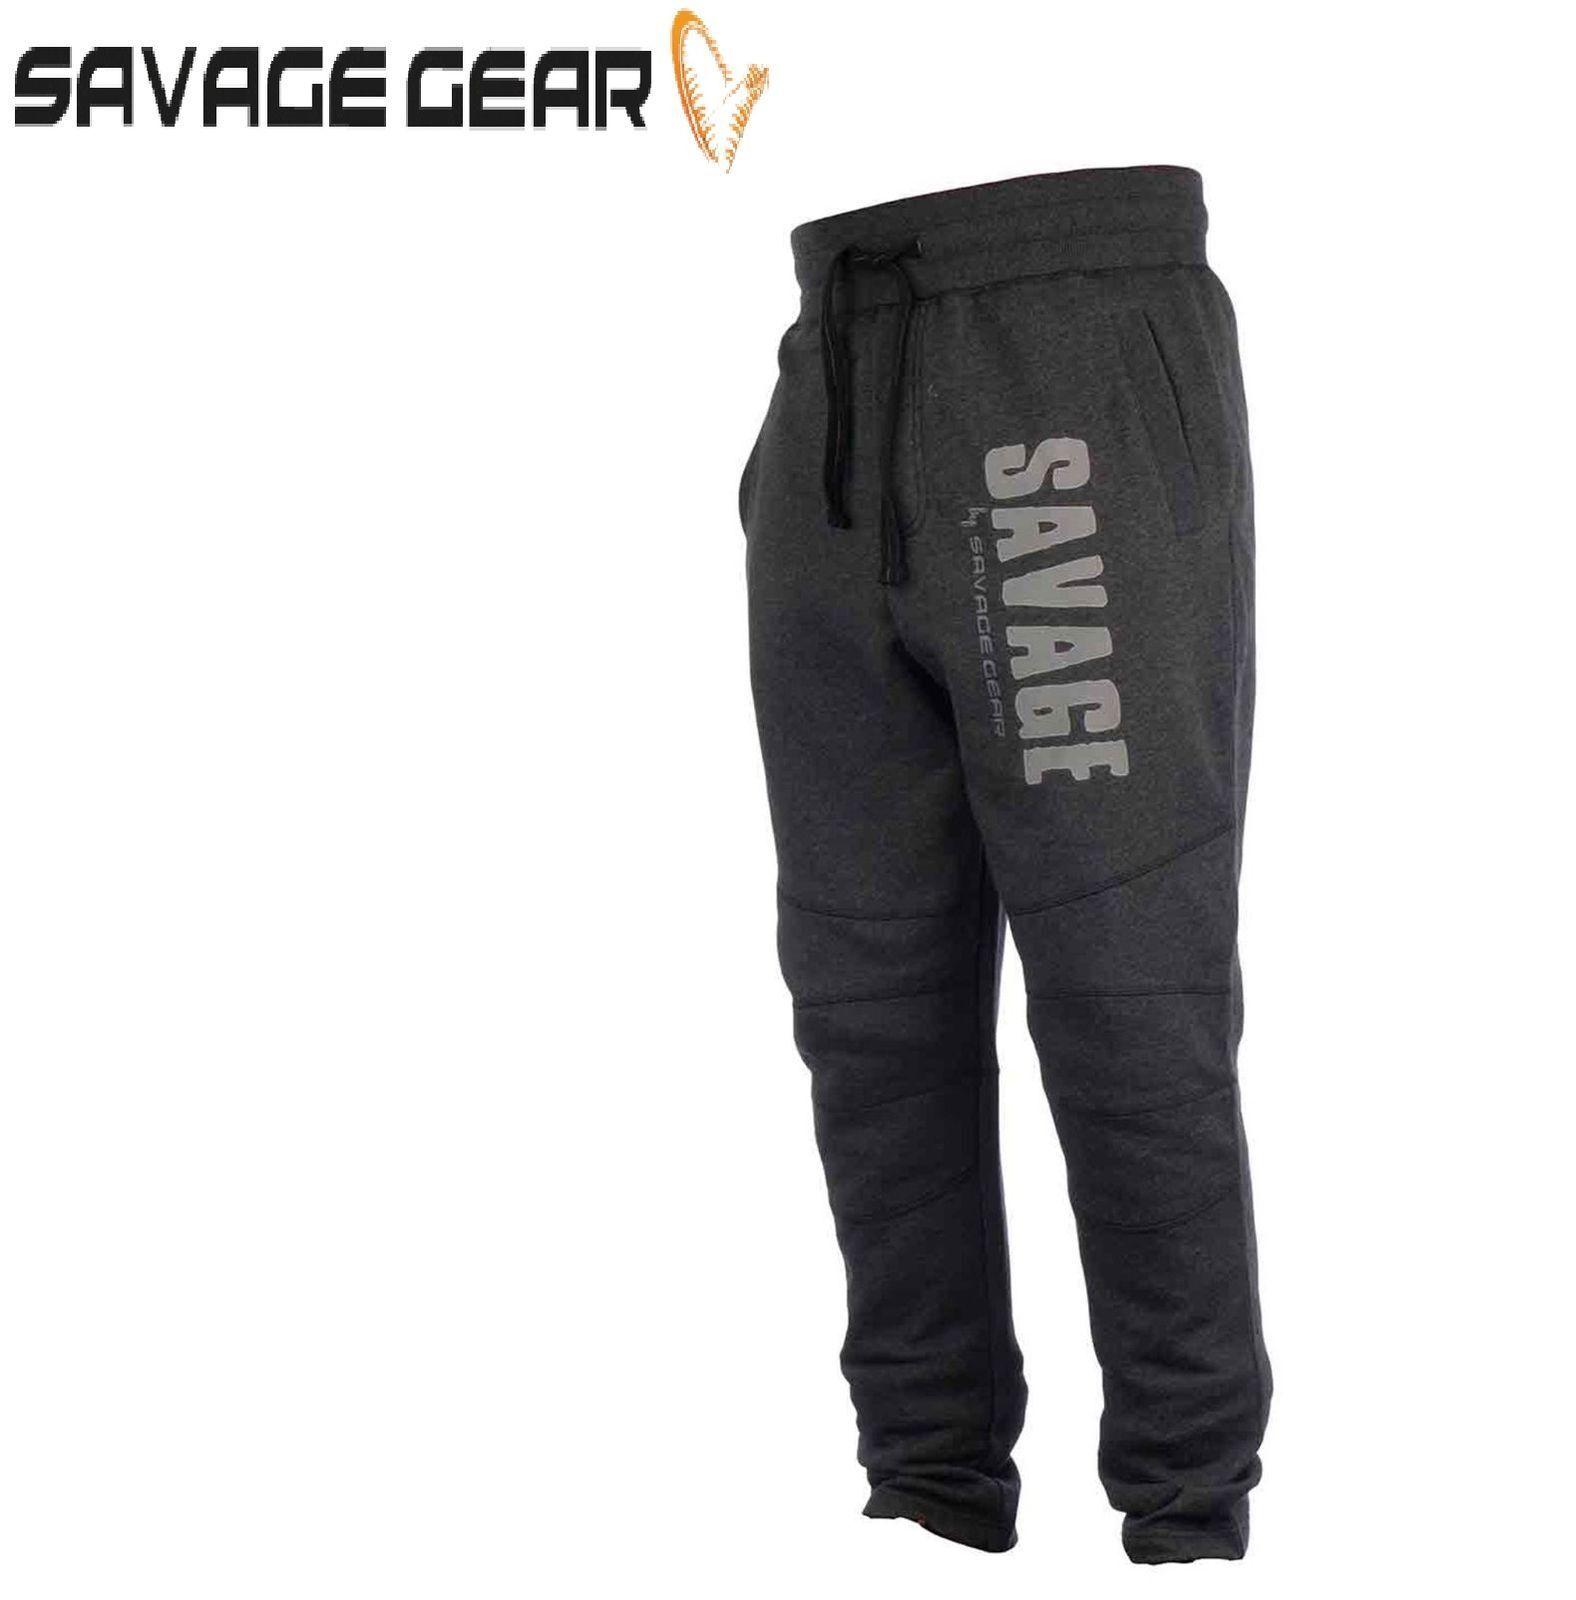 Savage Gear NEU Einfach Savage Joggers